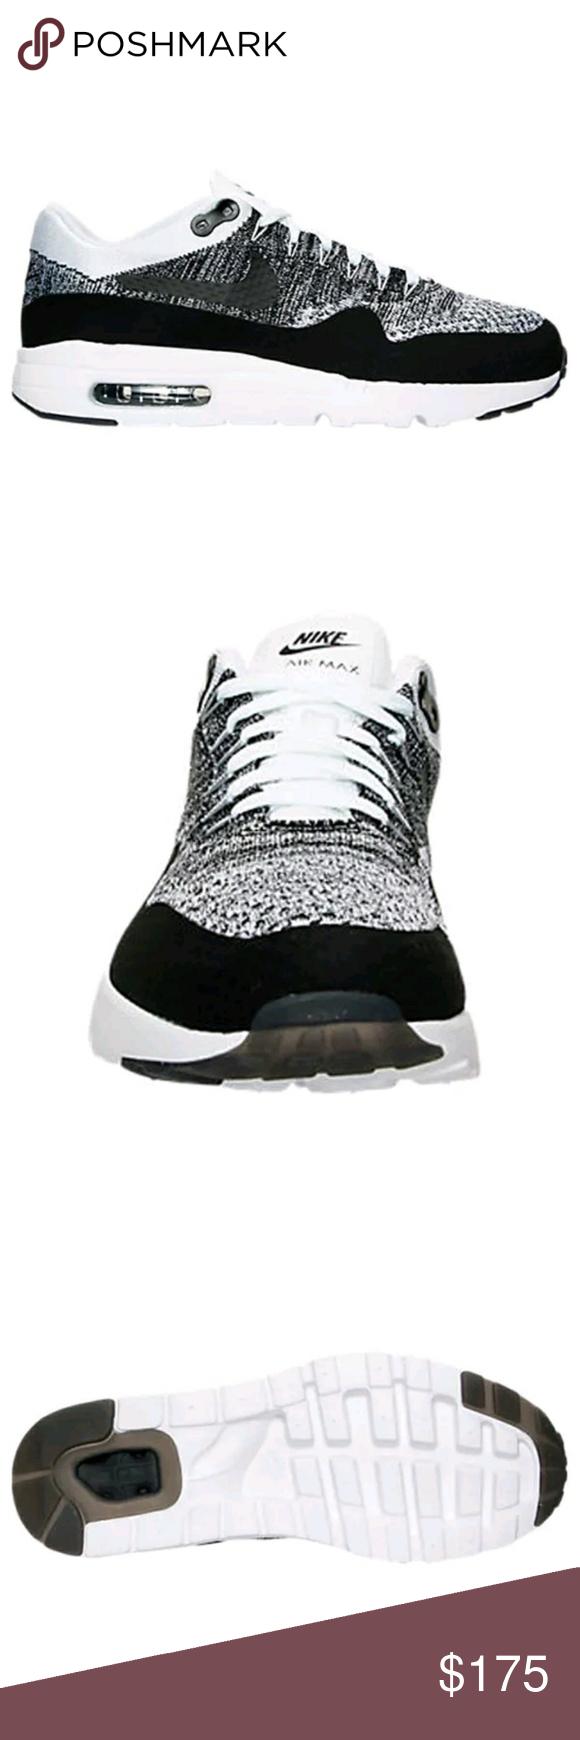 886b3b1faabf0 Nike Air Max 1 Ultra Flyknit 843384-100 OREO 11.5 Nike Air Max 1 Ultra  Flyknit 843384-100 Men s Running Shoes Color  White Black Style No  843384-100  100% ...